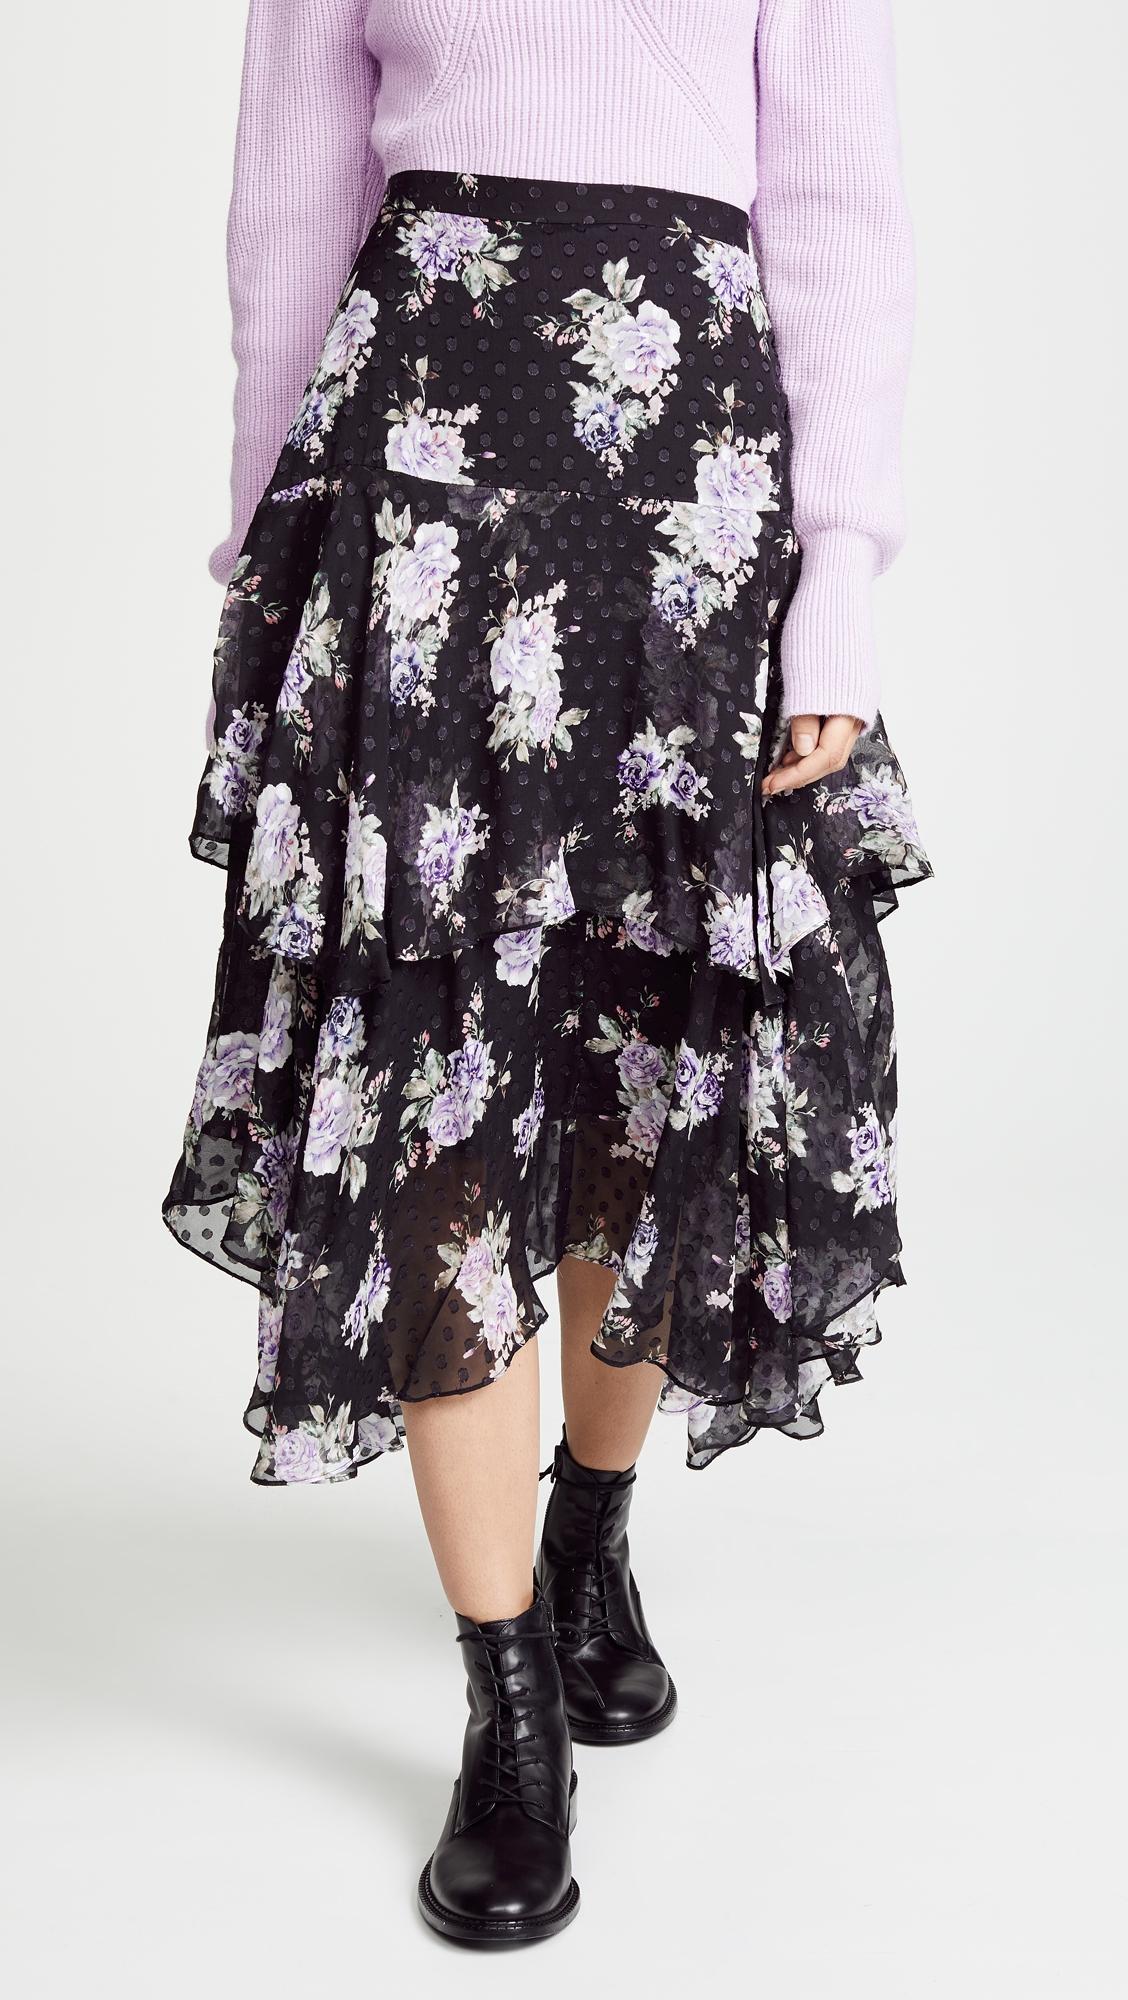 Alex Skirt Skirts, High waisted skirt, China fashion